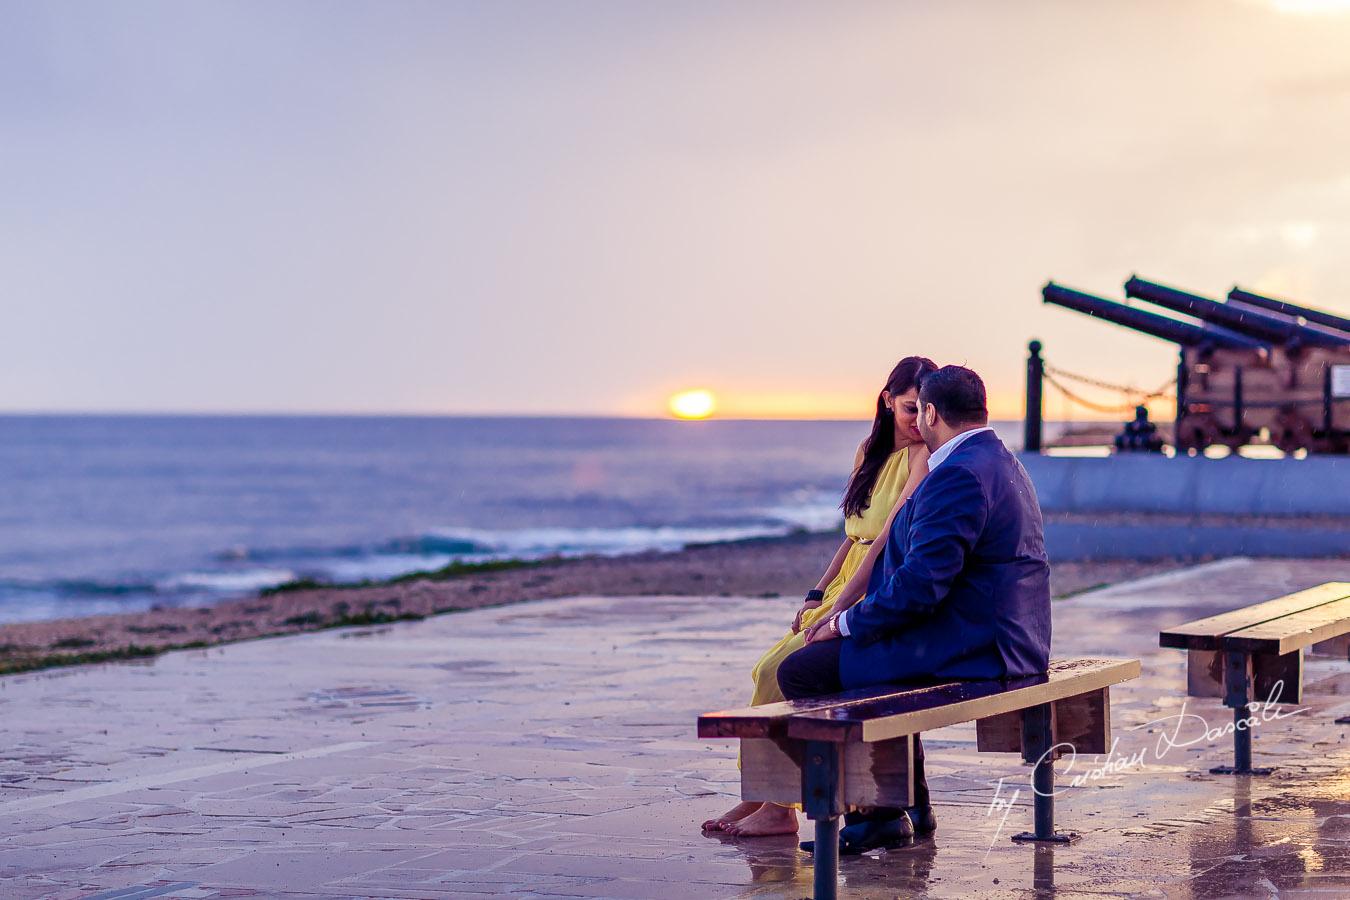 Destination Wedding Photographers in Paphos. Photographer: Cristian Dascalu